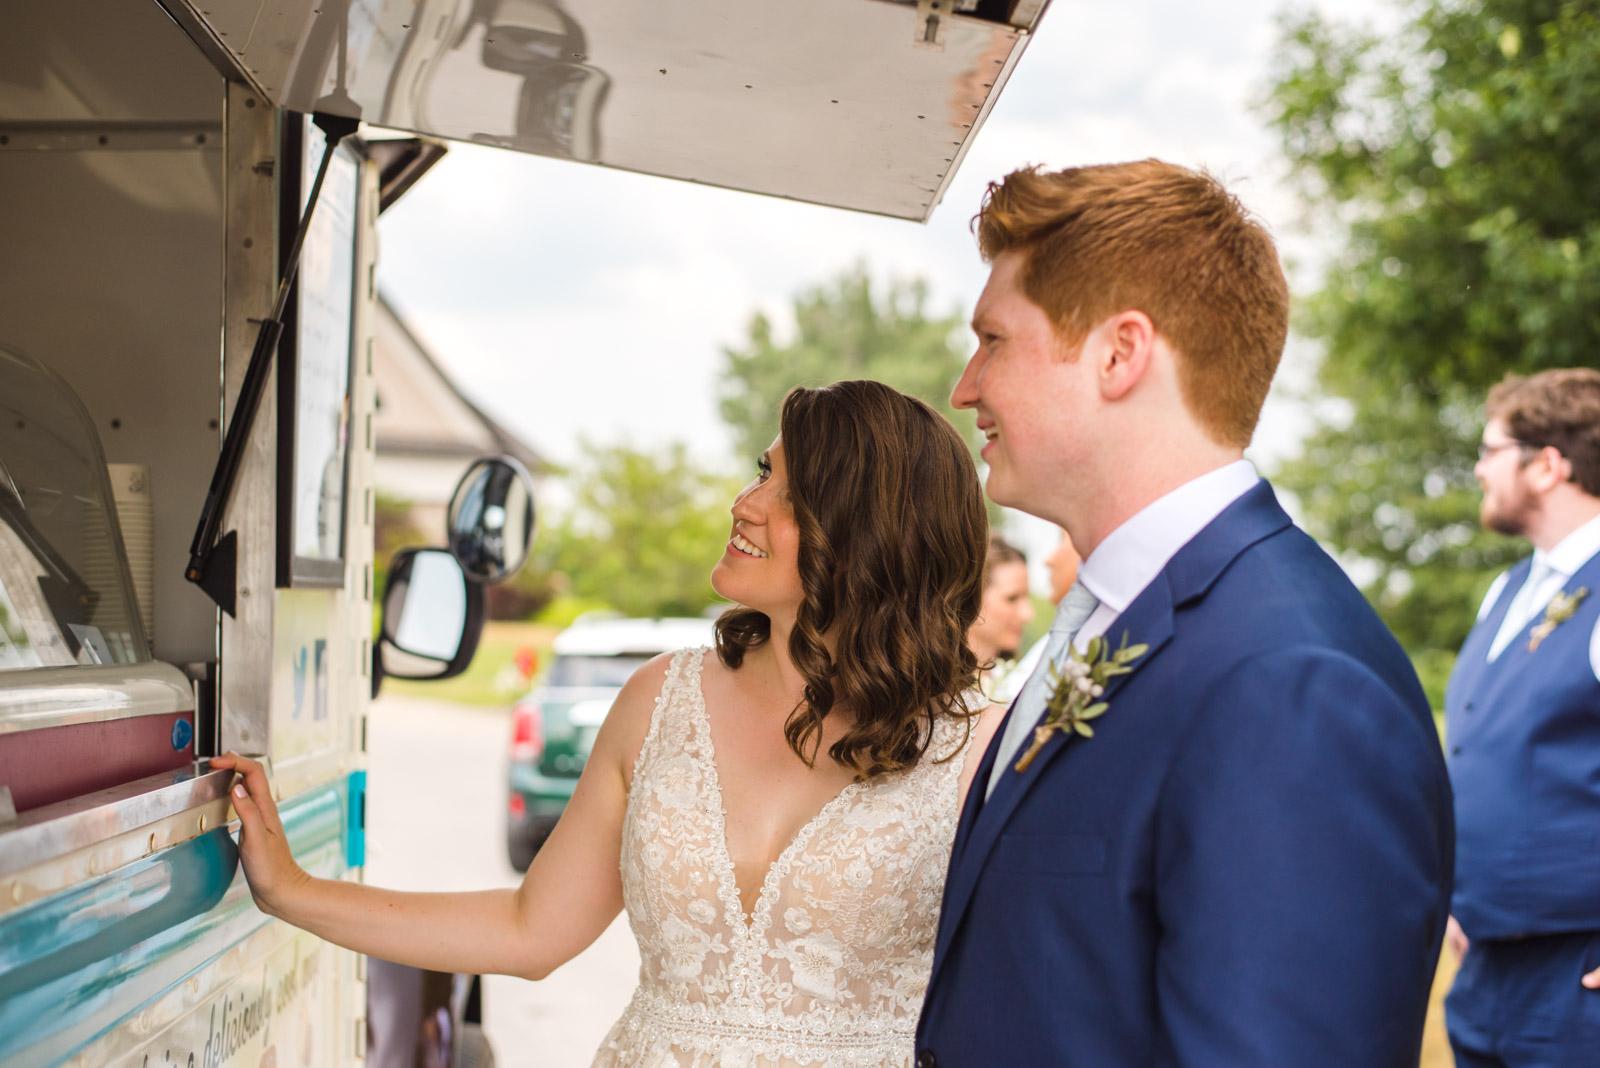 Emerson & Elicia's Golf Course Wedding Aidan & Leanne Hennebry Hamilton Wedding Videographers Photographers Niagara Hush Hush Photography & Film-29.jpg